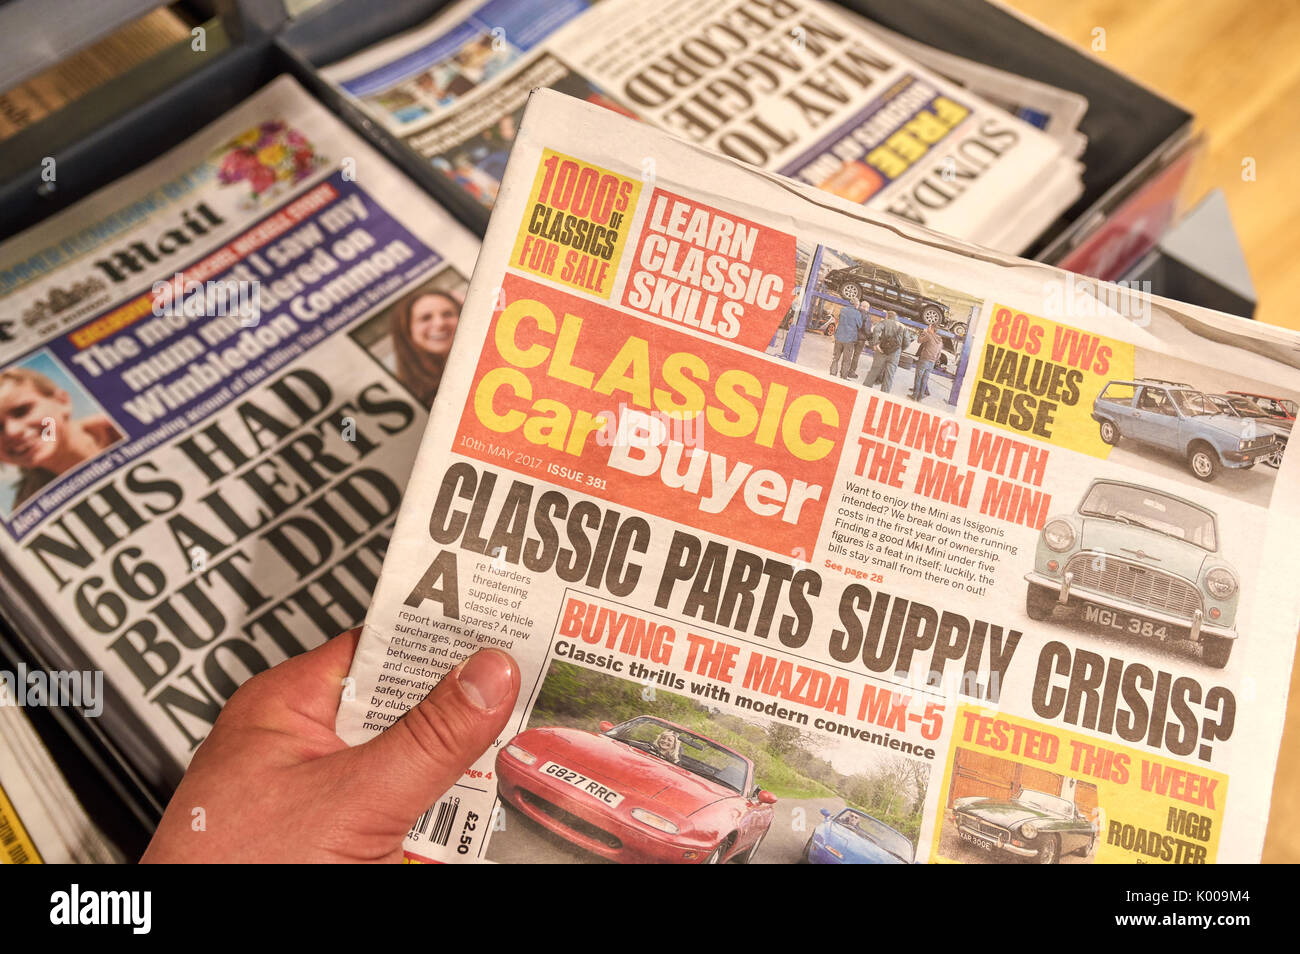 london, england - may 14, 2017 : classic car buyer newspaper